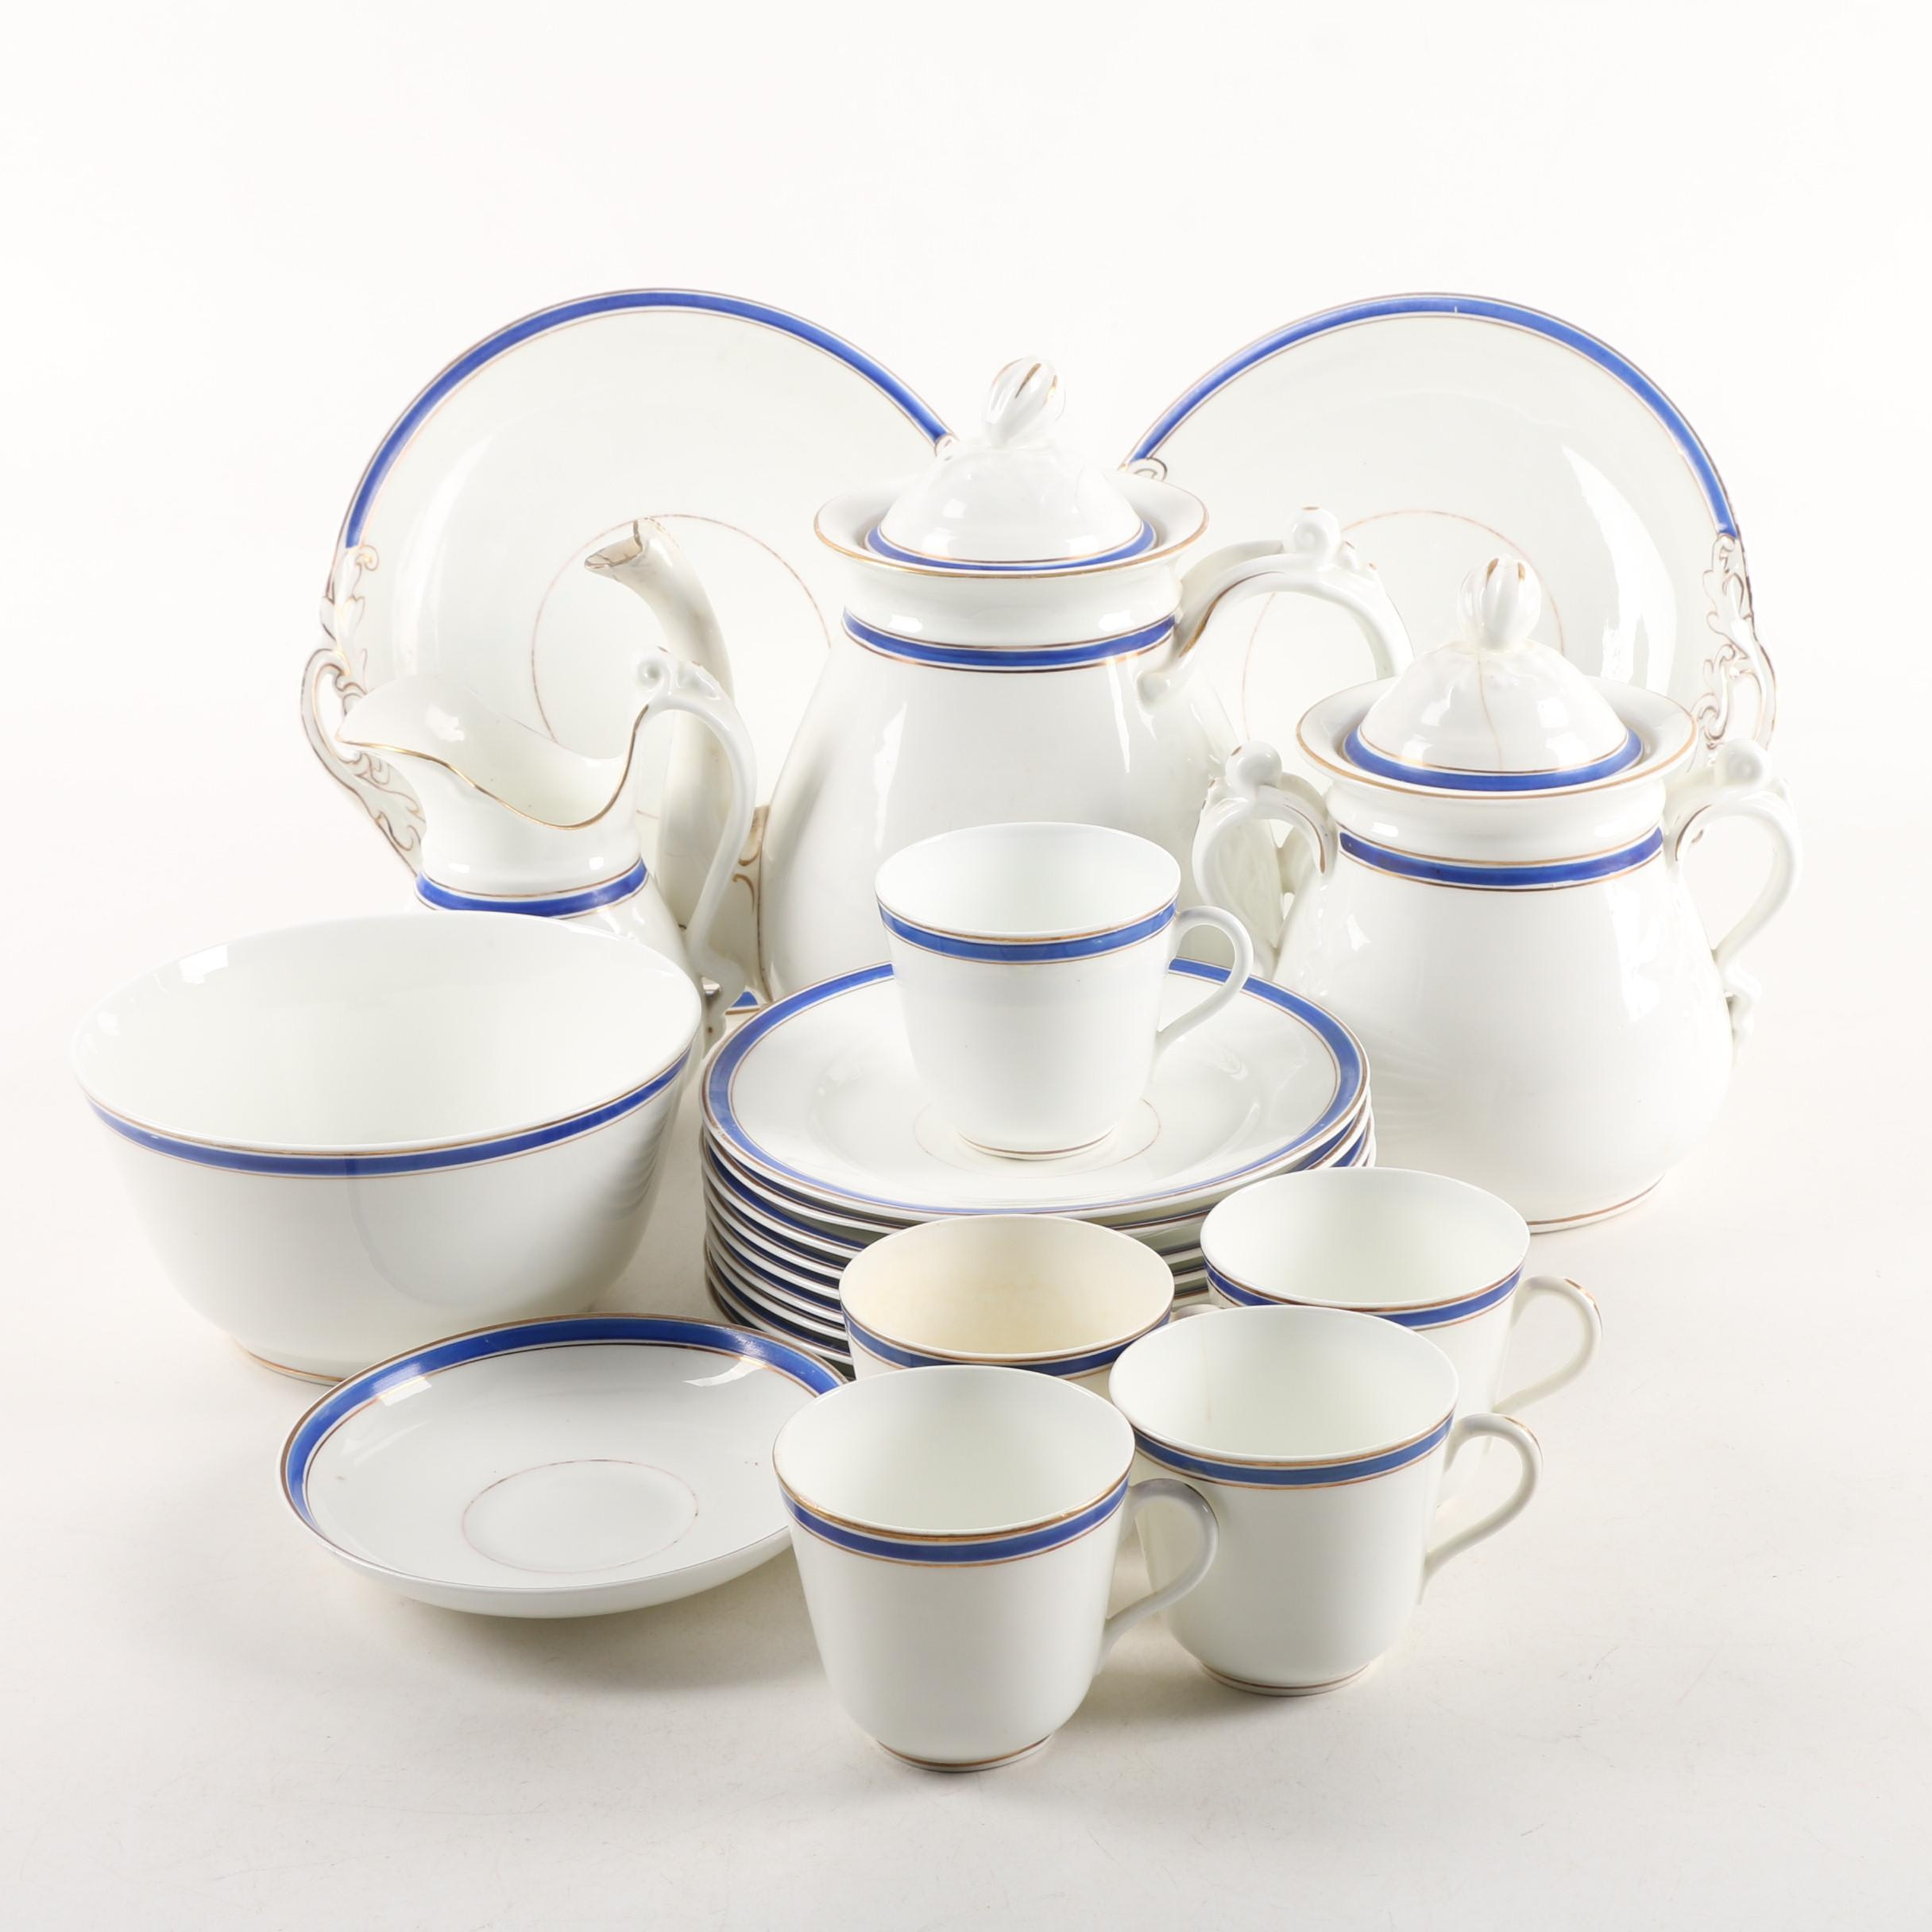 Antique Bridgwood u0026 Son Porcelain Tableware ca. & Antique Bridgwood u0026 Son Porcelain Tableware ca. 1860 : EBTH